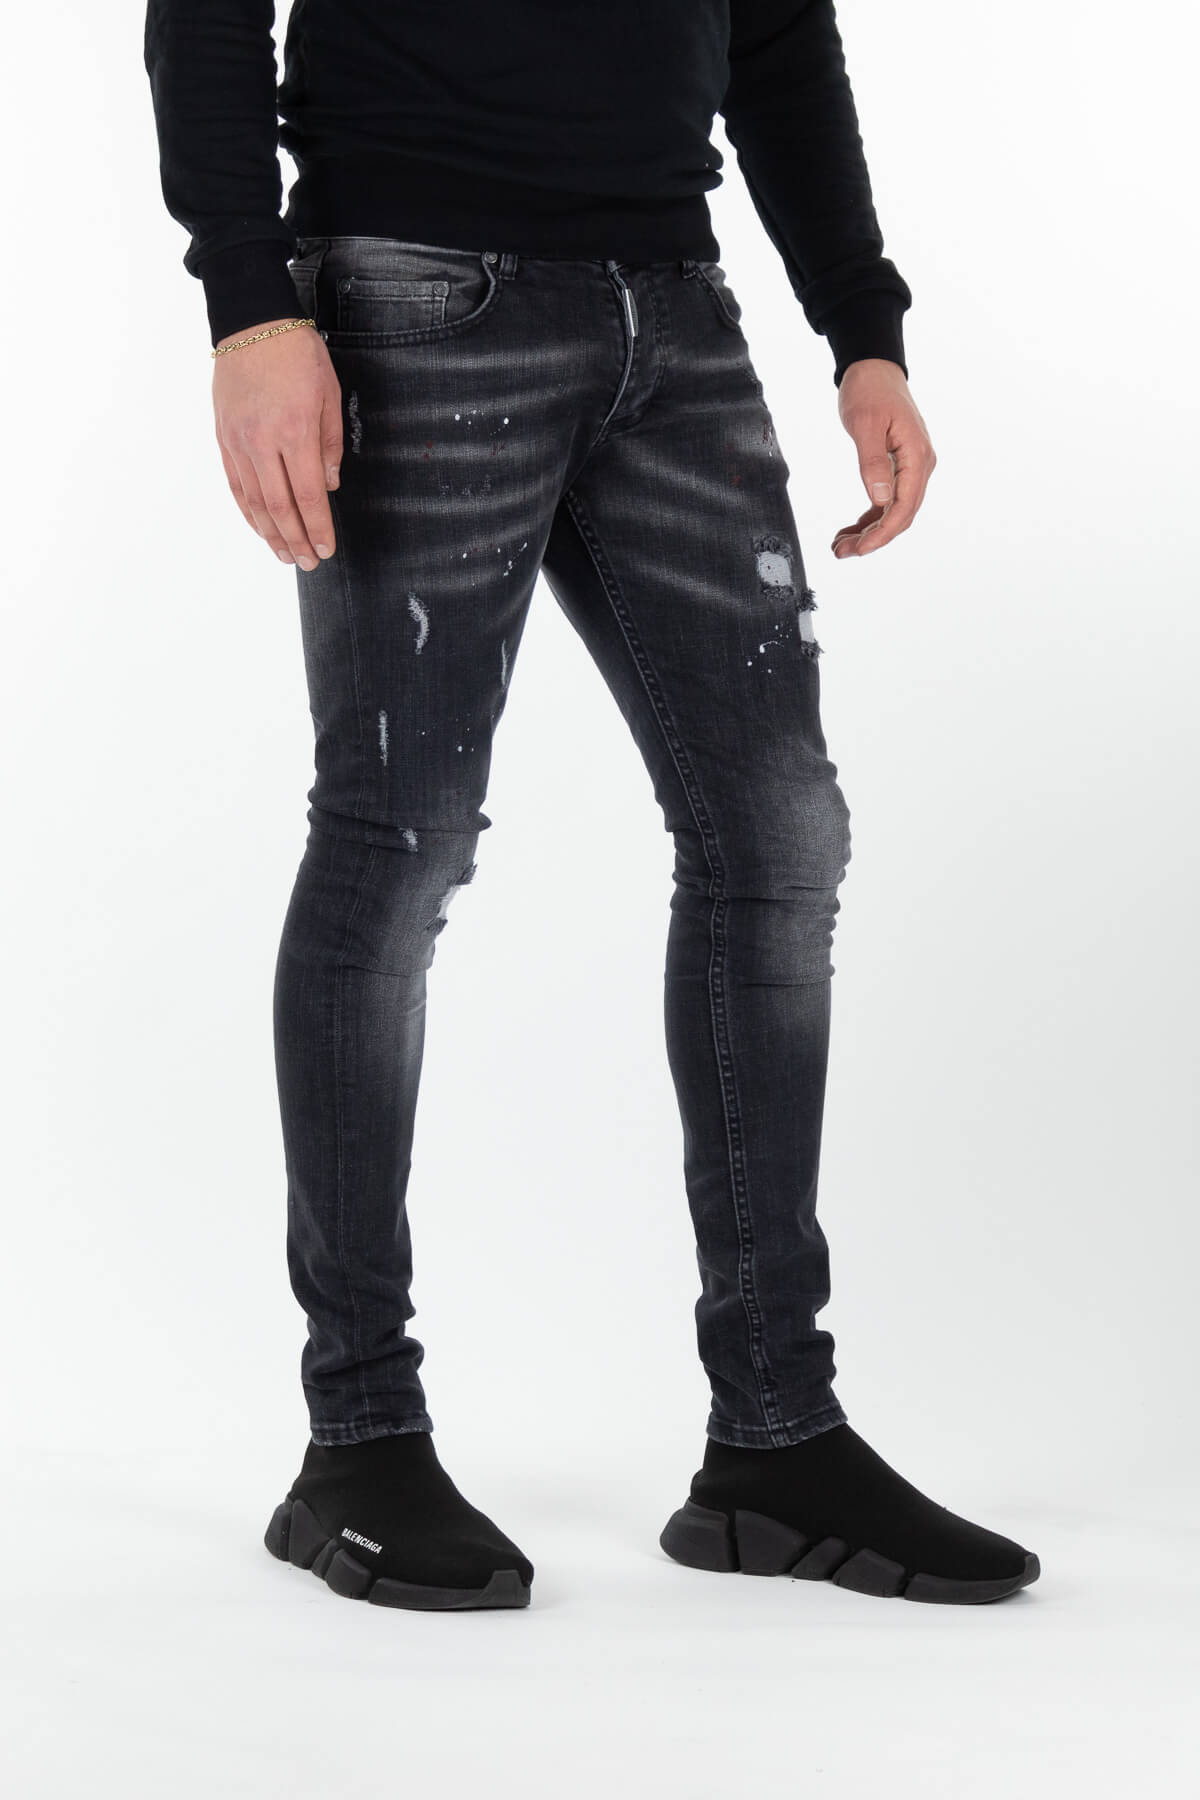 Sevilla Deluxe Dark Jeans-2